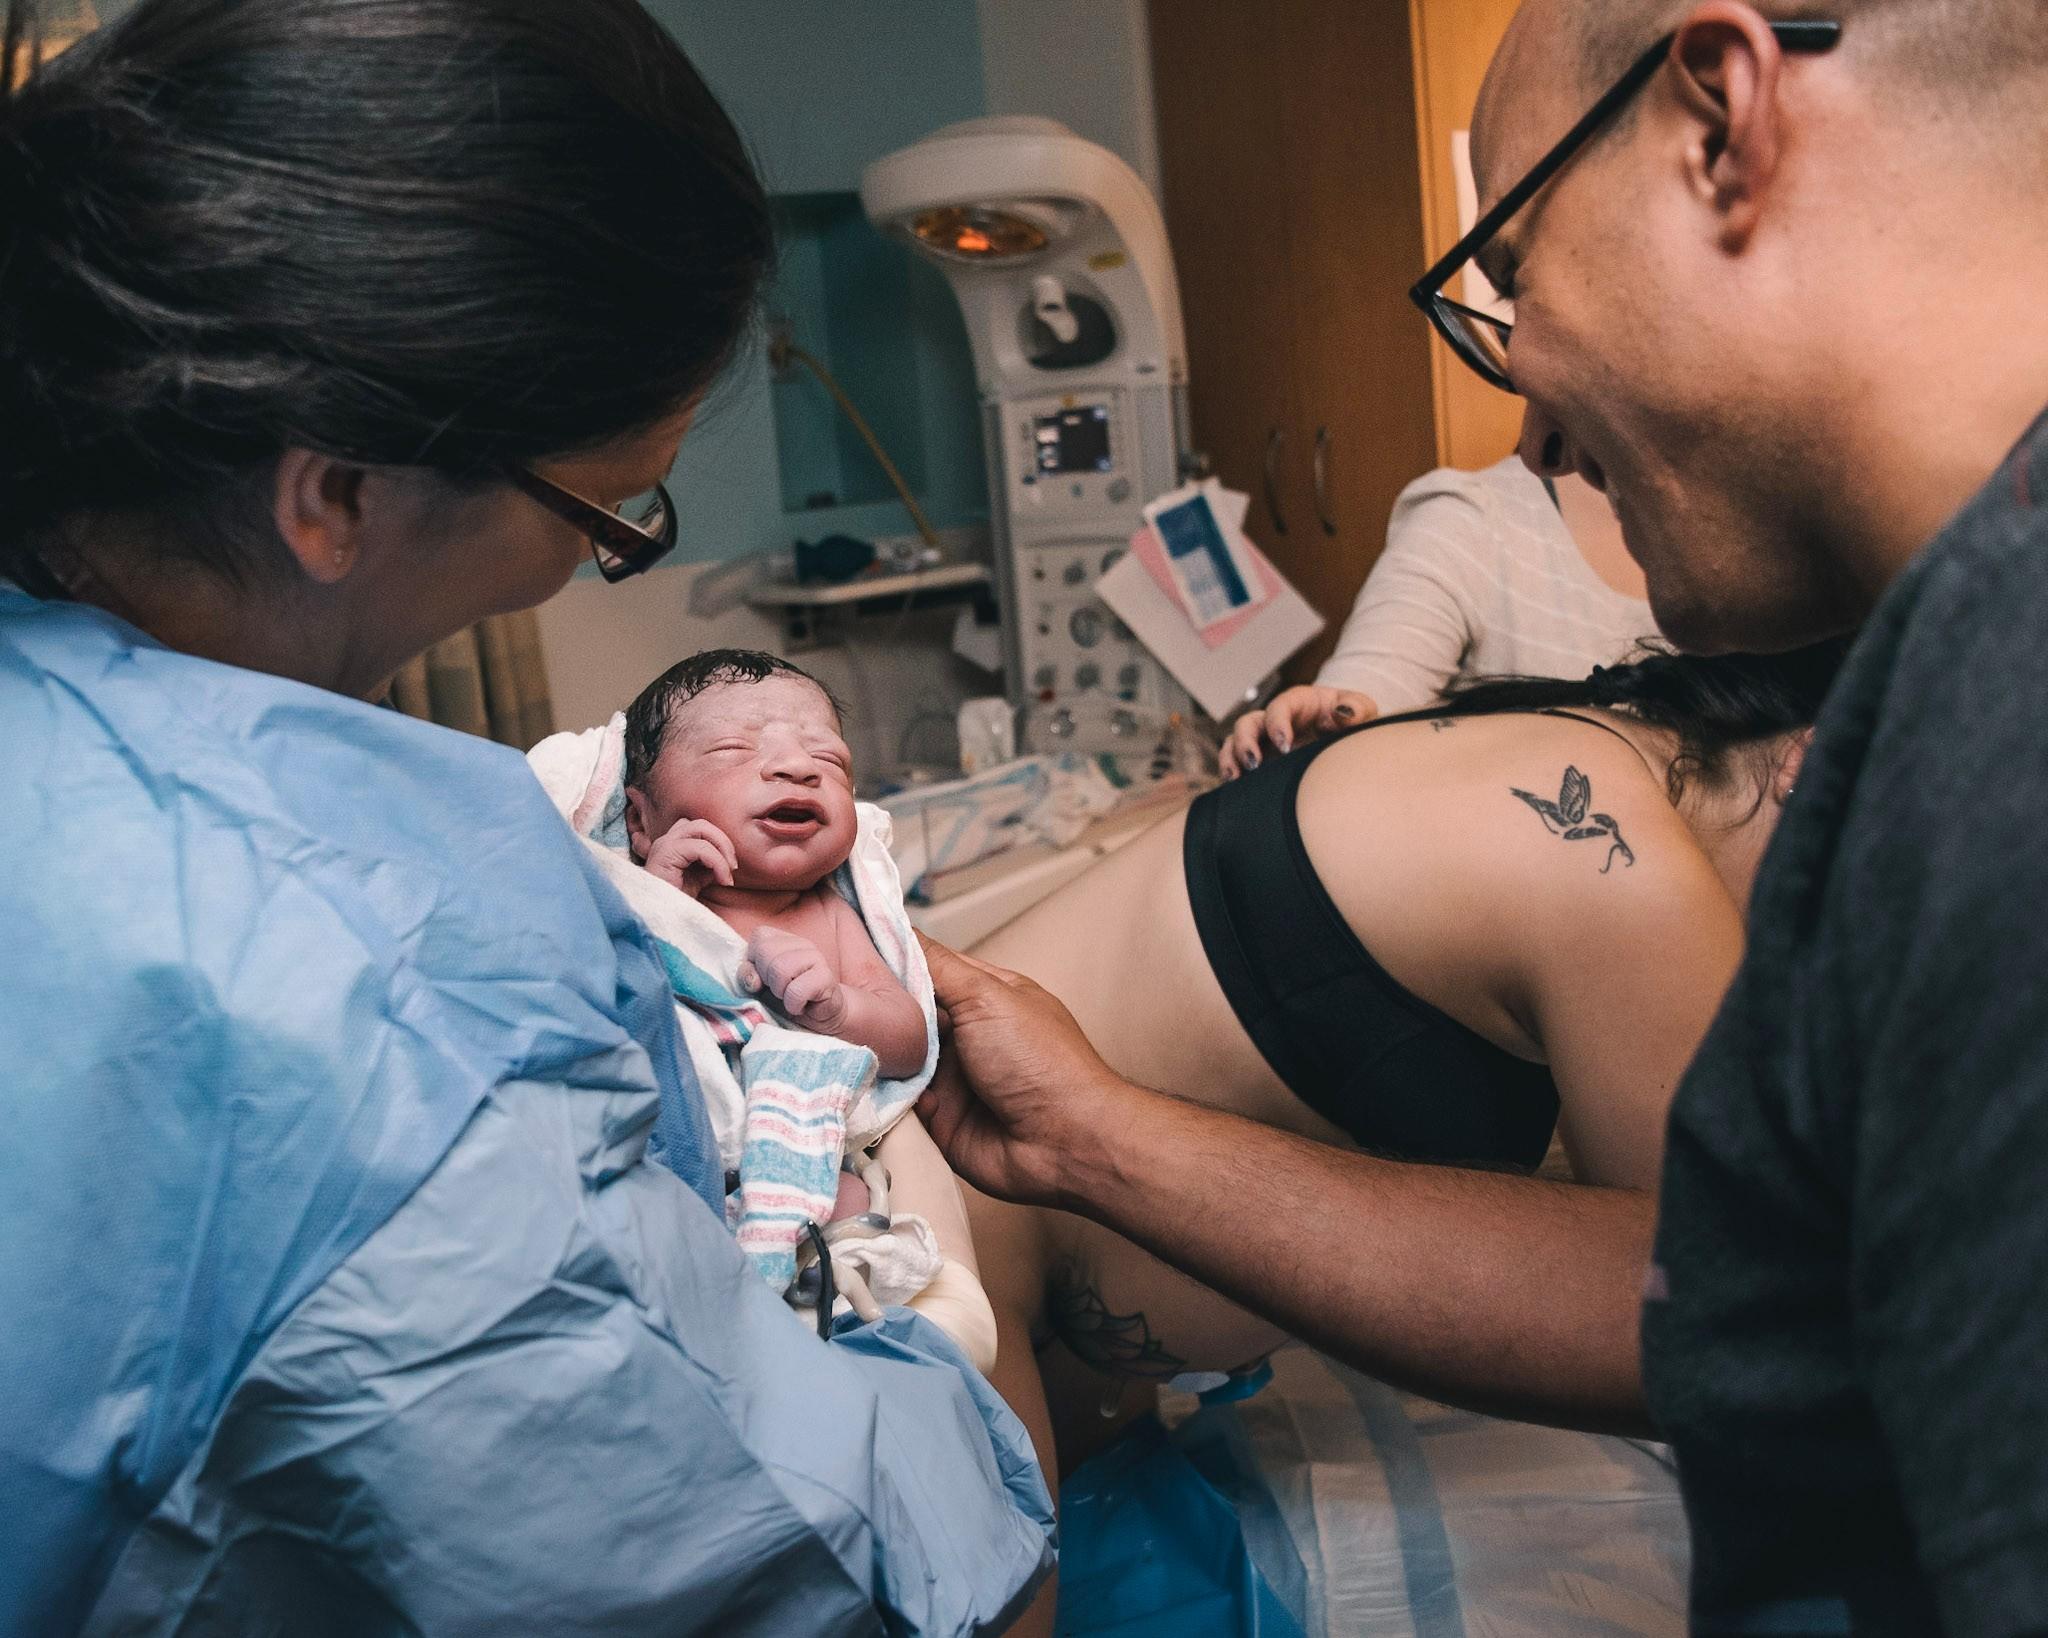 Joli Adore Photography - Baltimore, Annapolis, DC, Virginia - Birth & Newborn Photographer Videographer